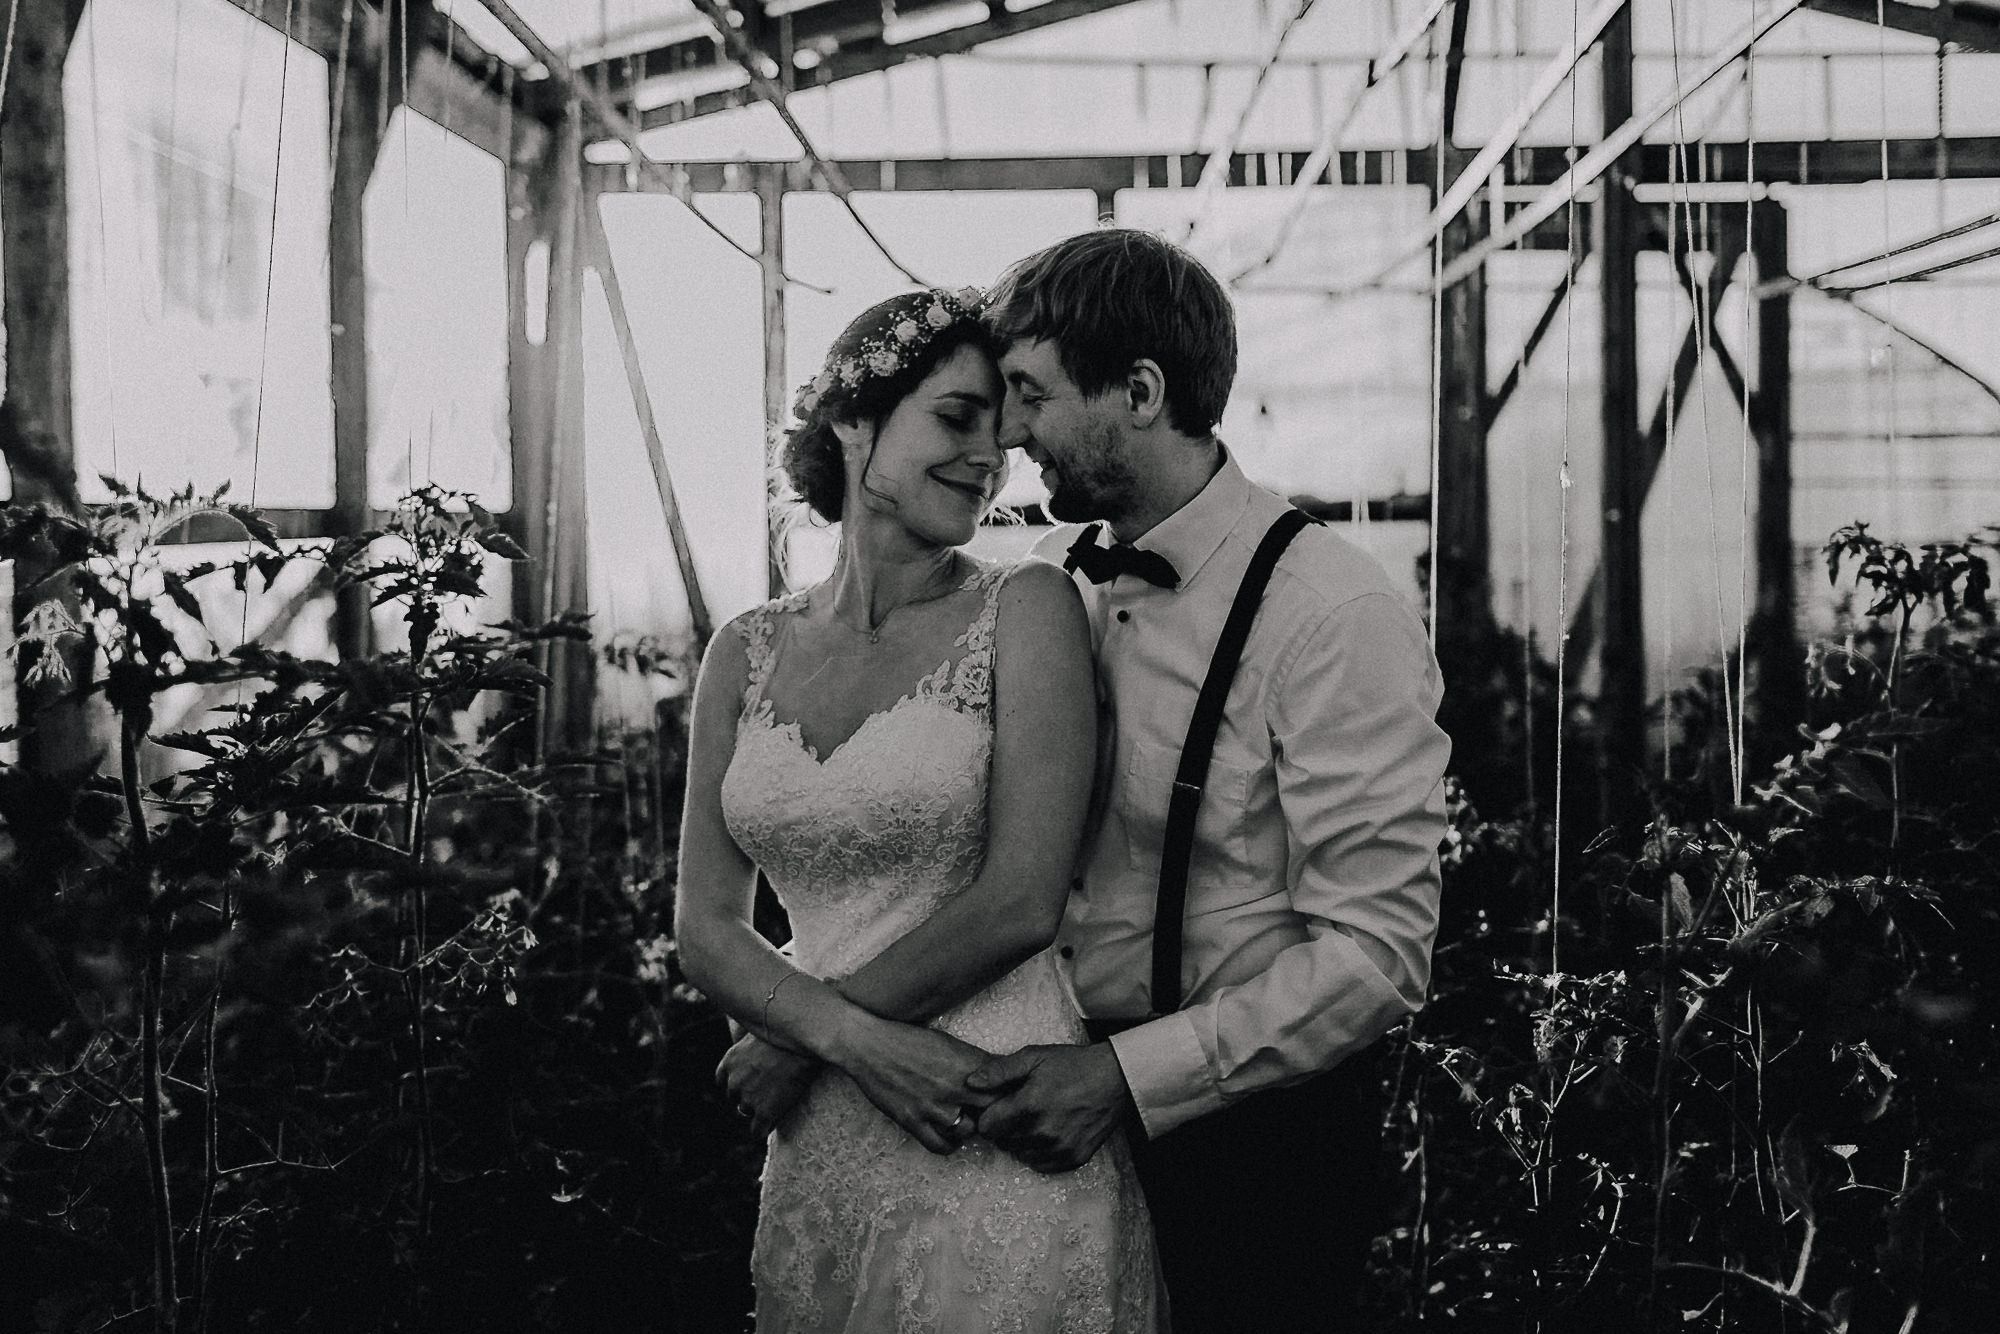 Hochzeitsfotograf-Potsdam-Tom-und-Lia-Fotografie-5DT_2073